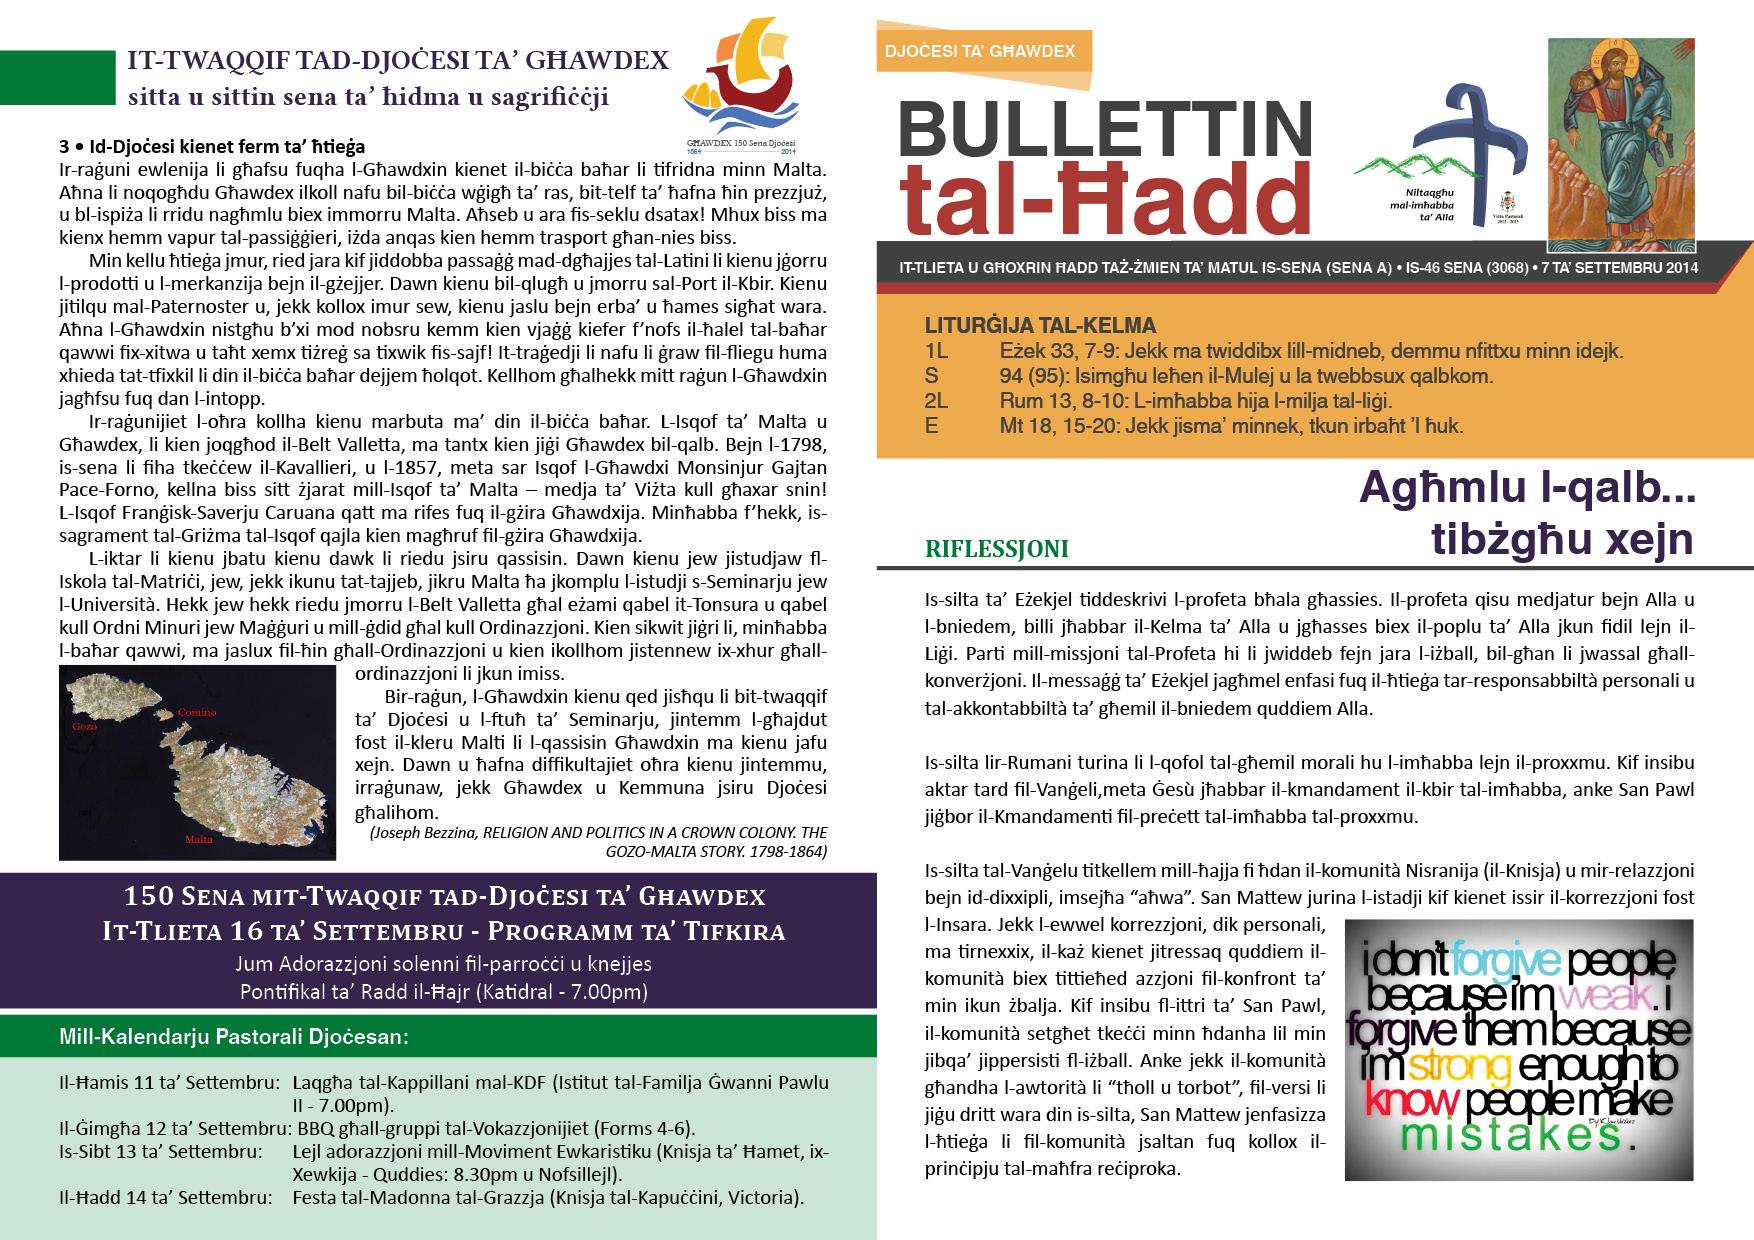 bullettin-2014-settembru-07.jpg